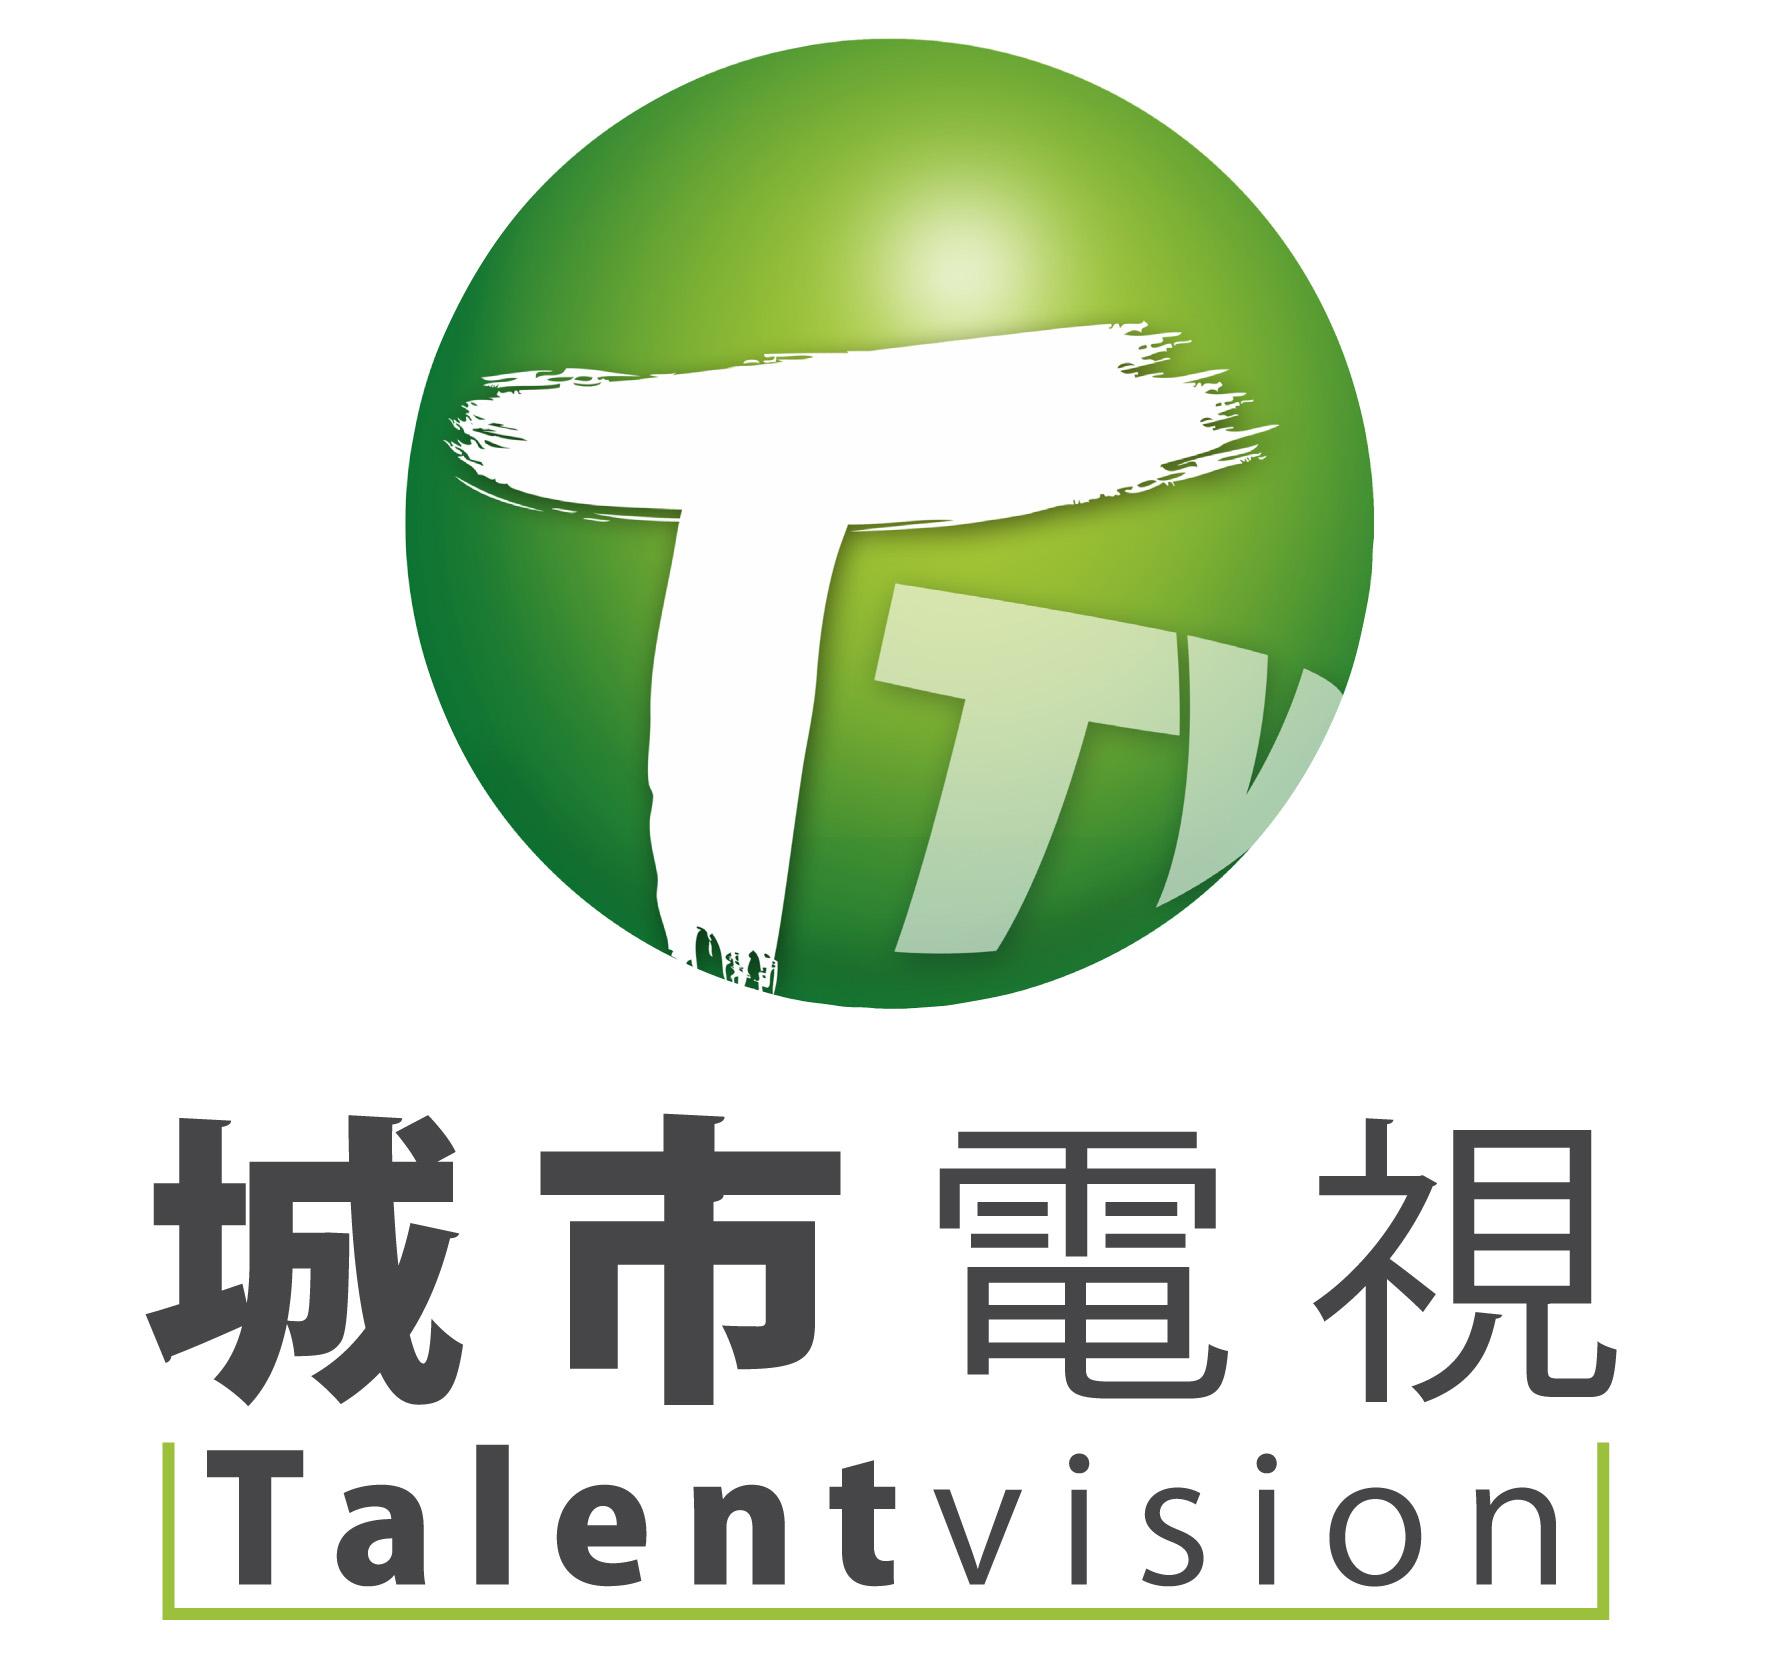 talentvision tv